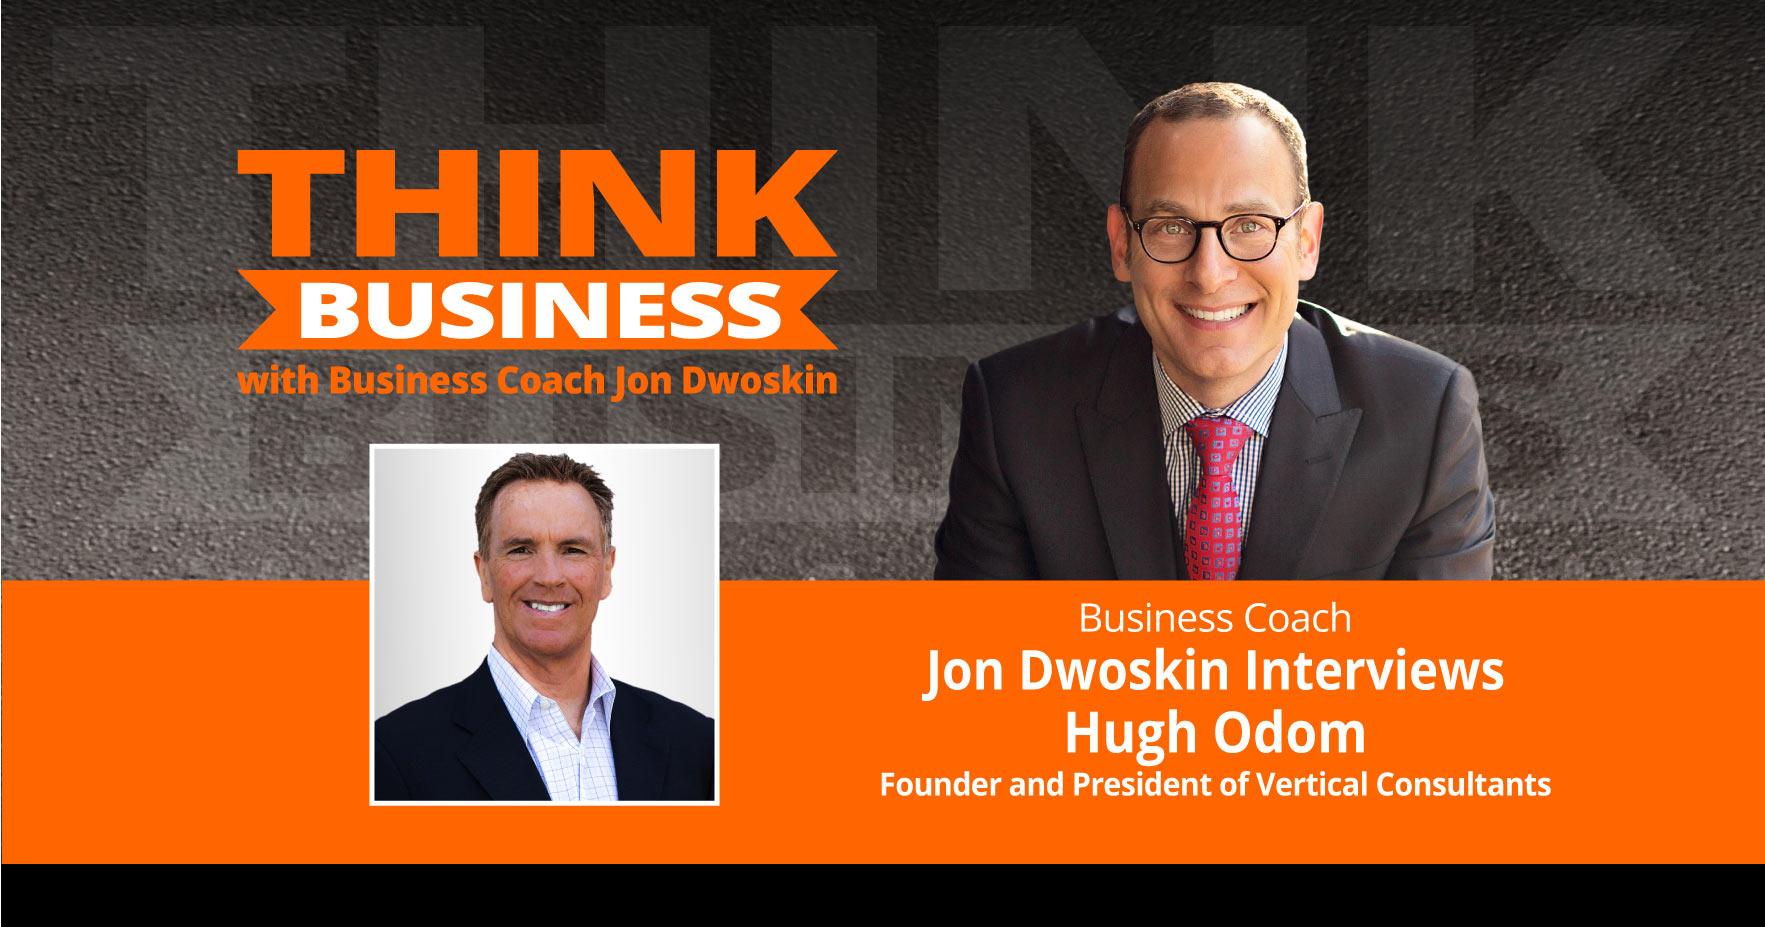 THINK Business Podcast: Jon Dwoskin Talks with Hugh Odom